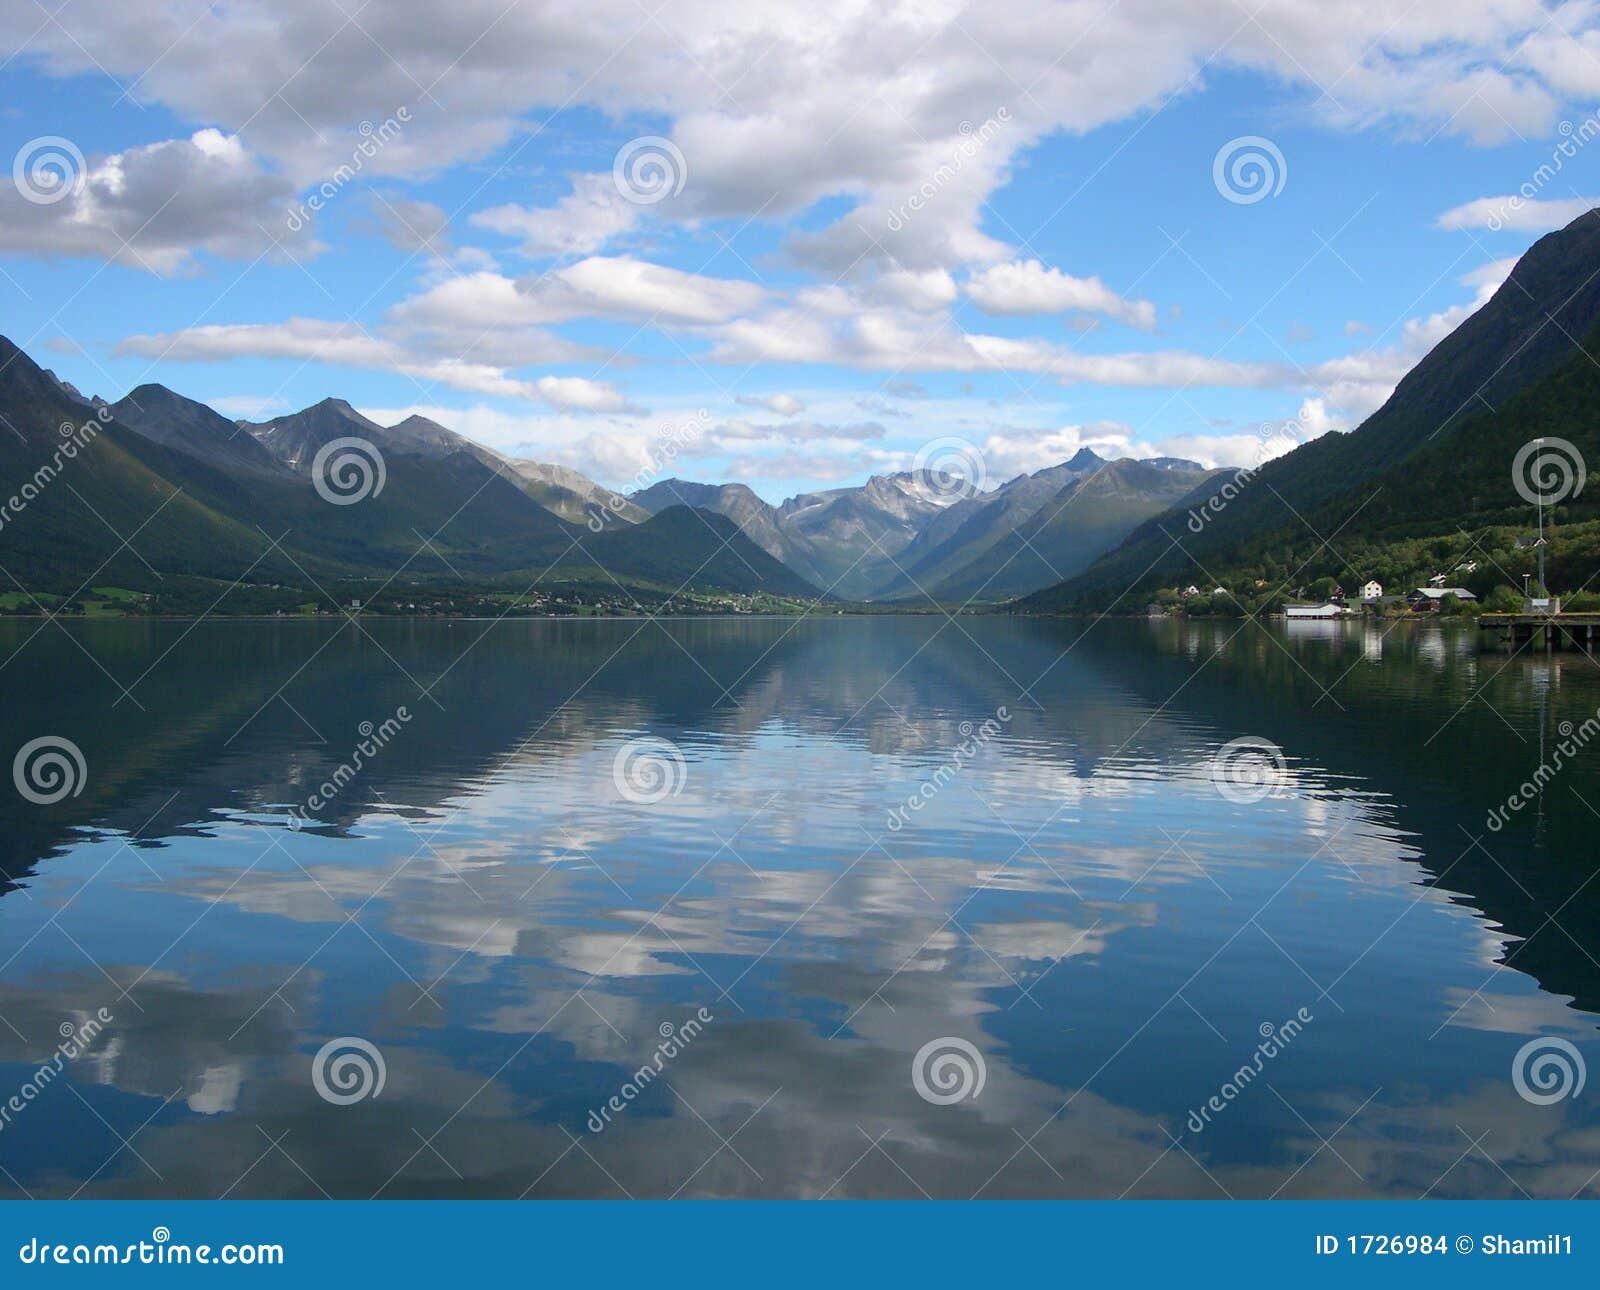 Andlsnesfjords near norway